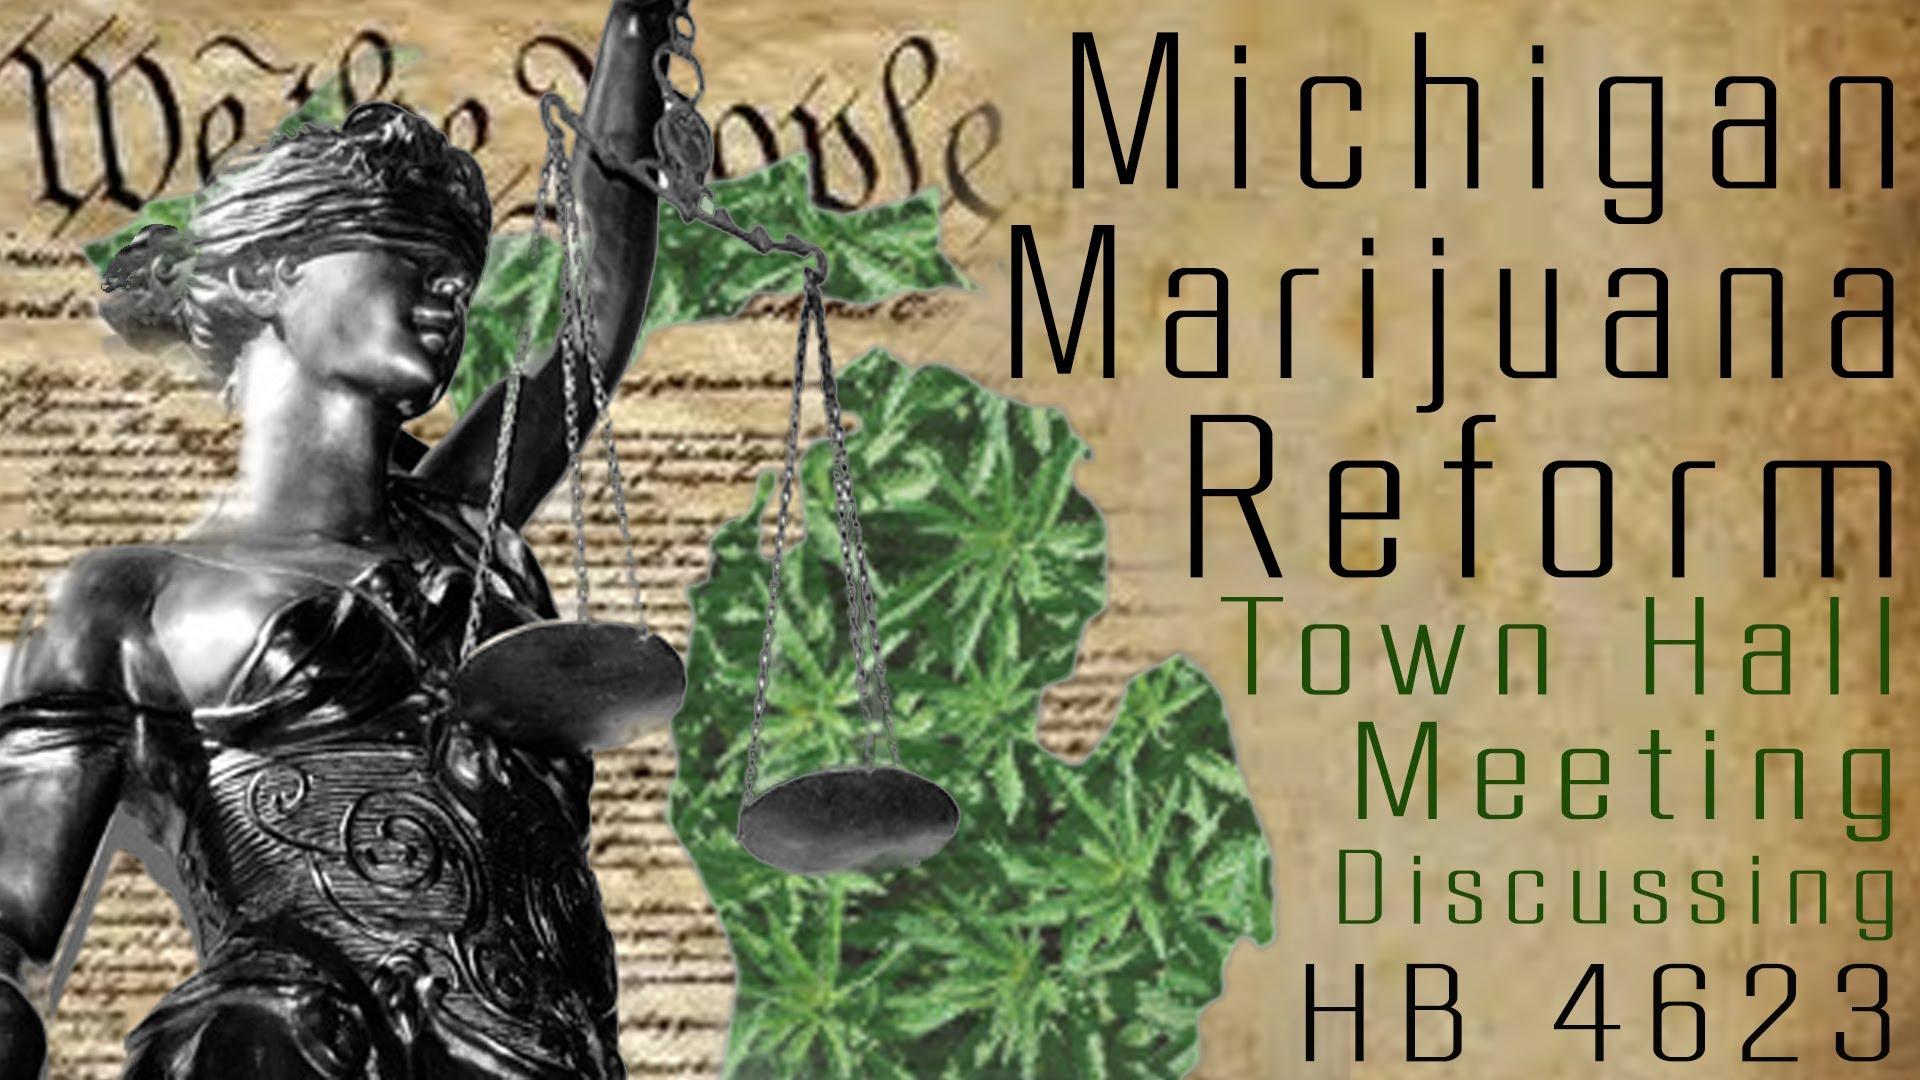 Michigan Marijuana Reform: Town Meeting to discuss Decriminalization and HB 4623